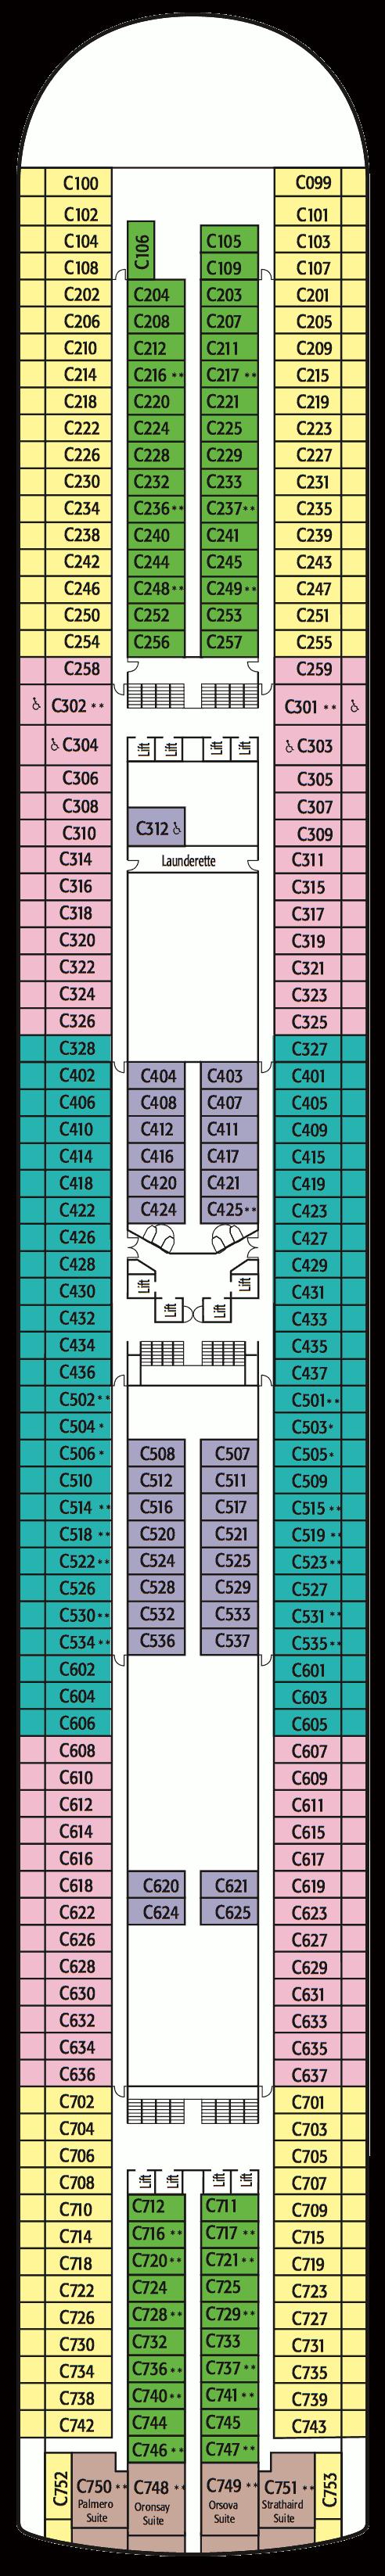 Azura Deck 10